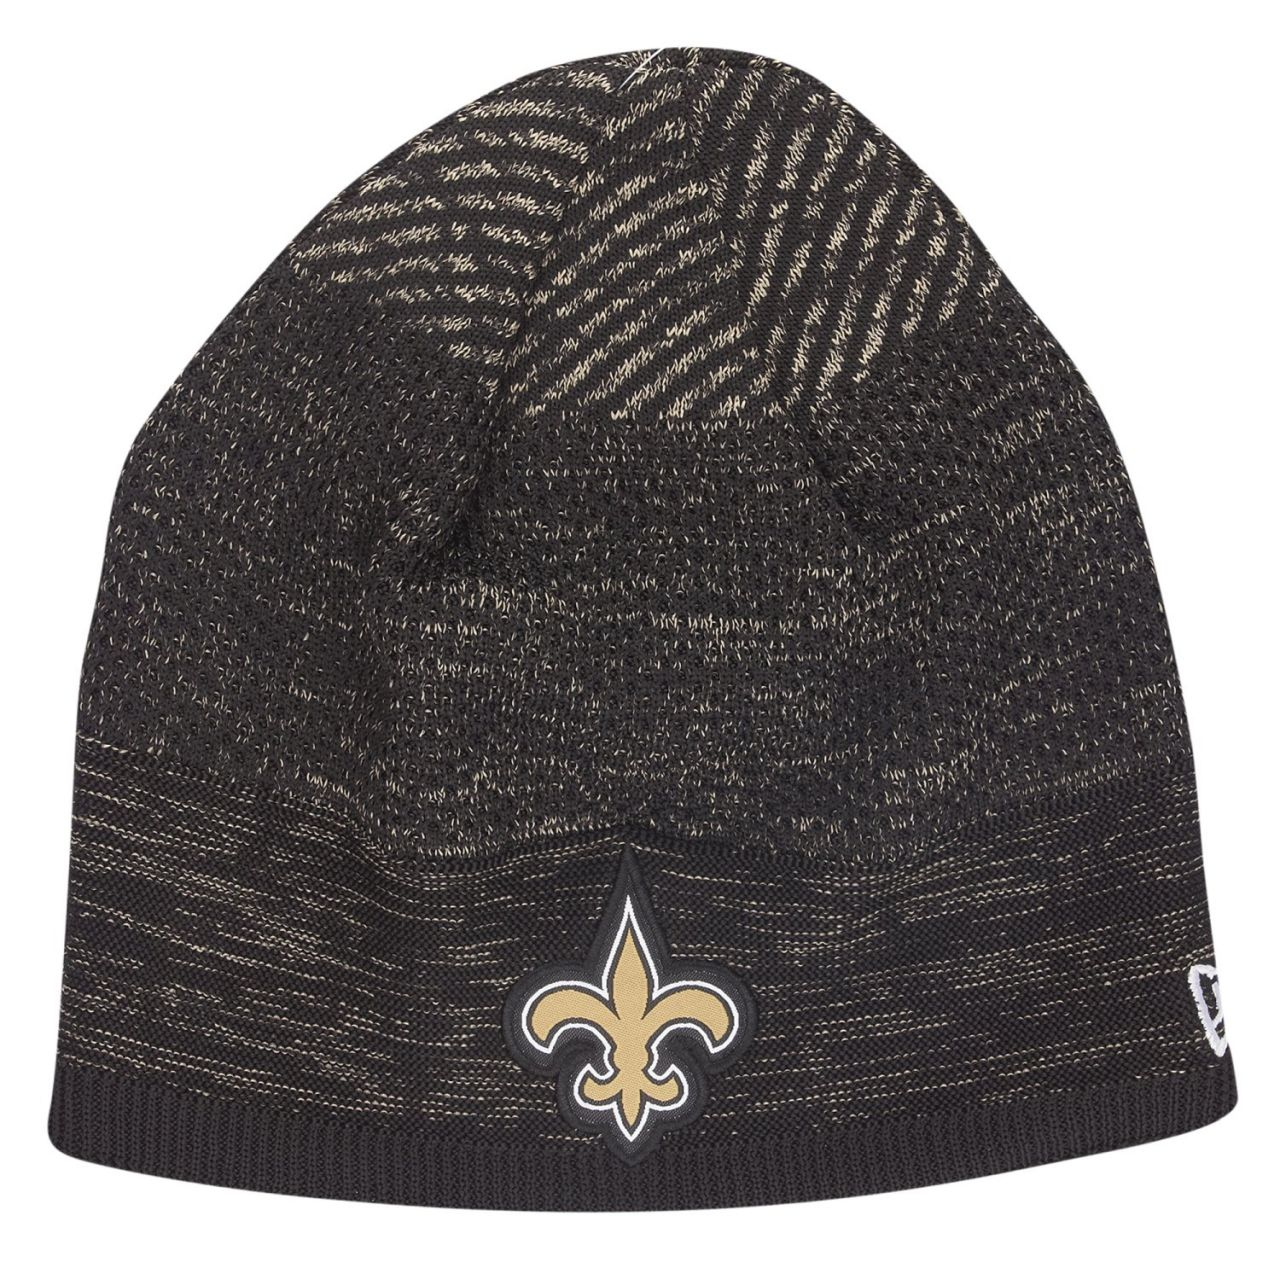 amfoo - New Era TECH KNIT Wintermütze NFL Beanie New Orleans Saints